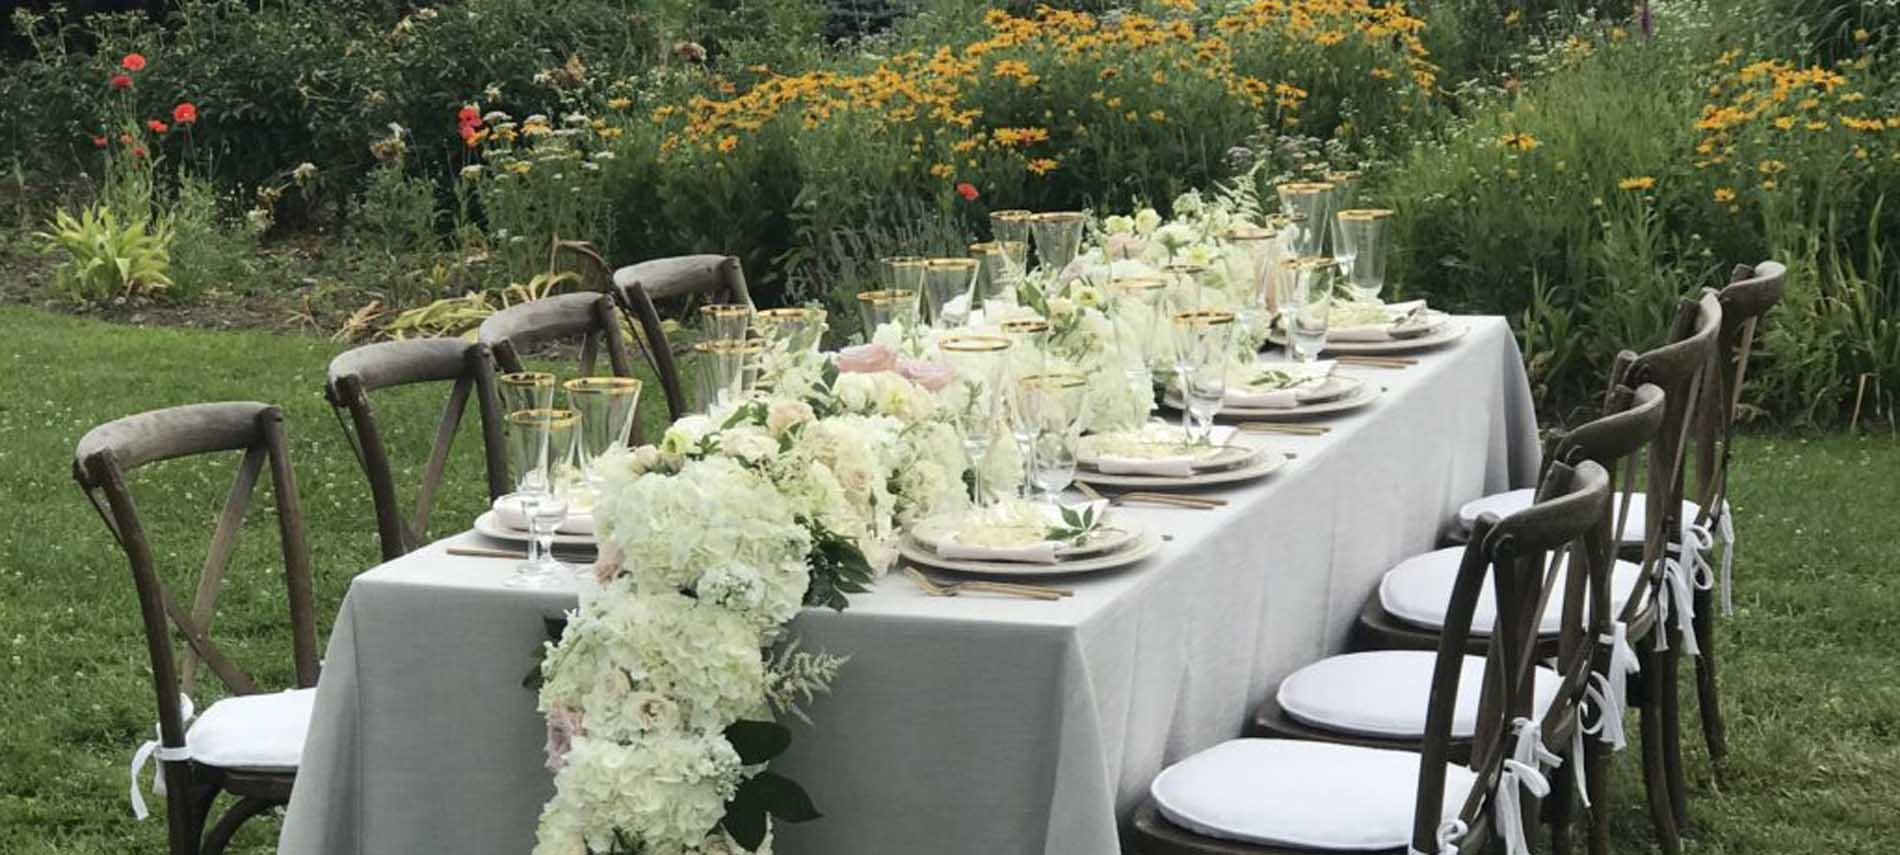 wedding intimate garden table trapp lodge